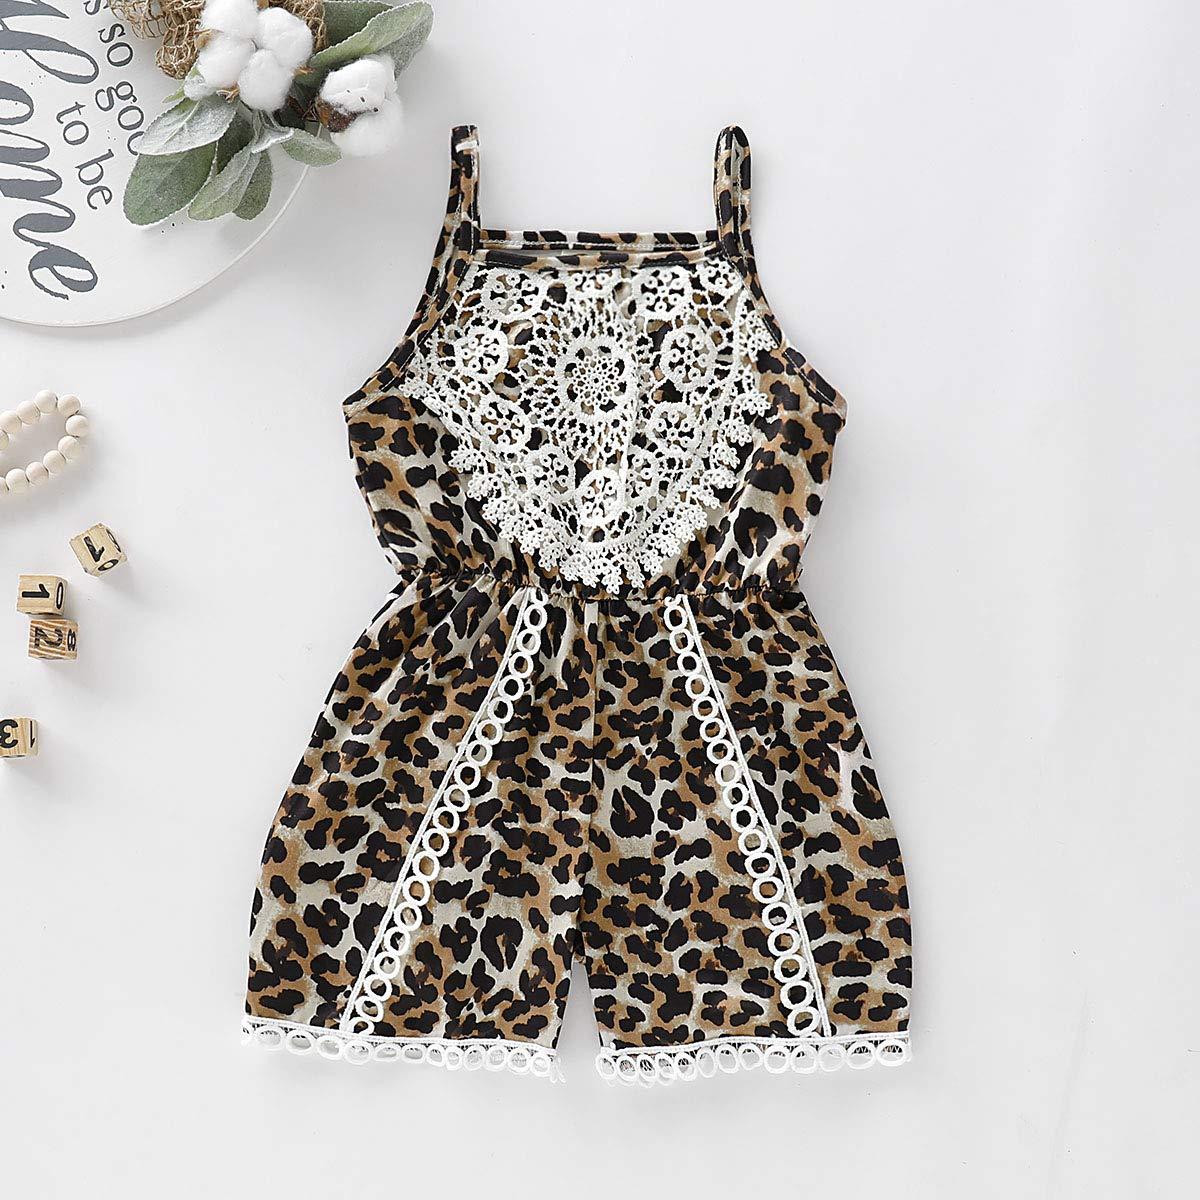 CM C/&M WODRO Newborn Baby Toddler Girls Sunflower Romper Strap Backless Bodysuit Jumpsuit Outfits Clothes Summer